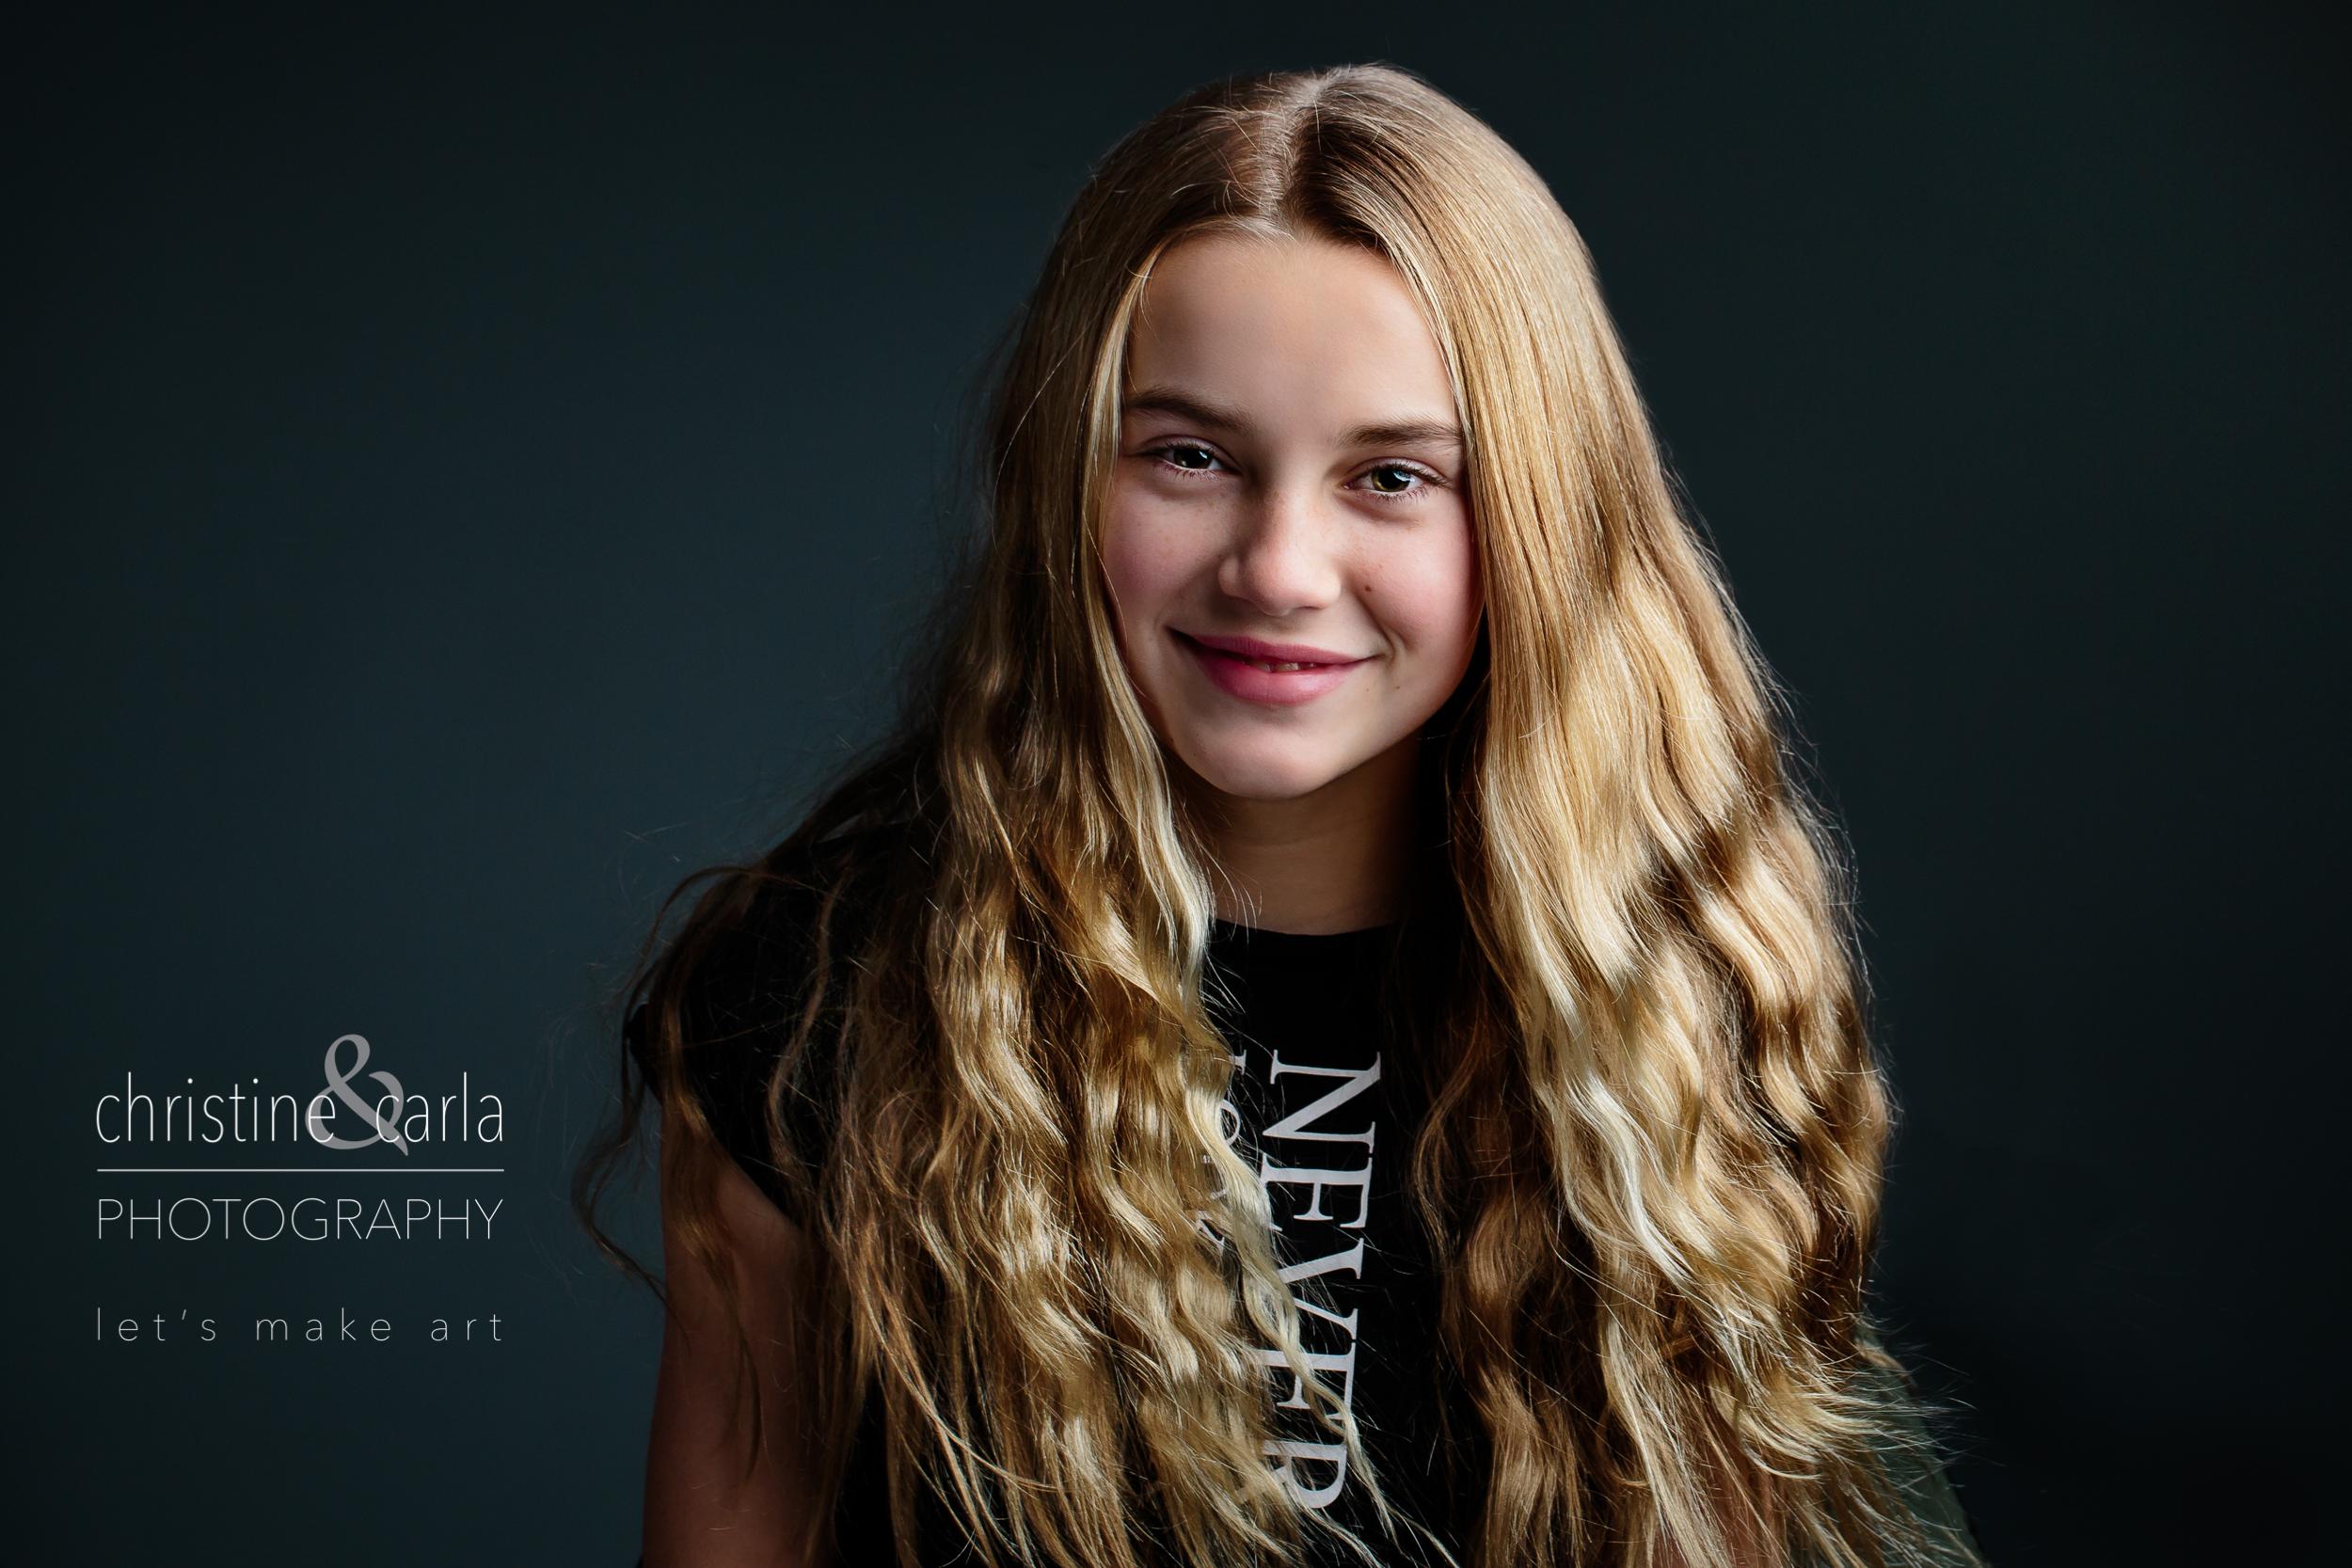 Portraitphotography-1.jpg